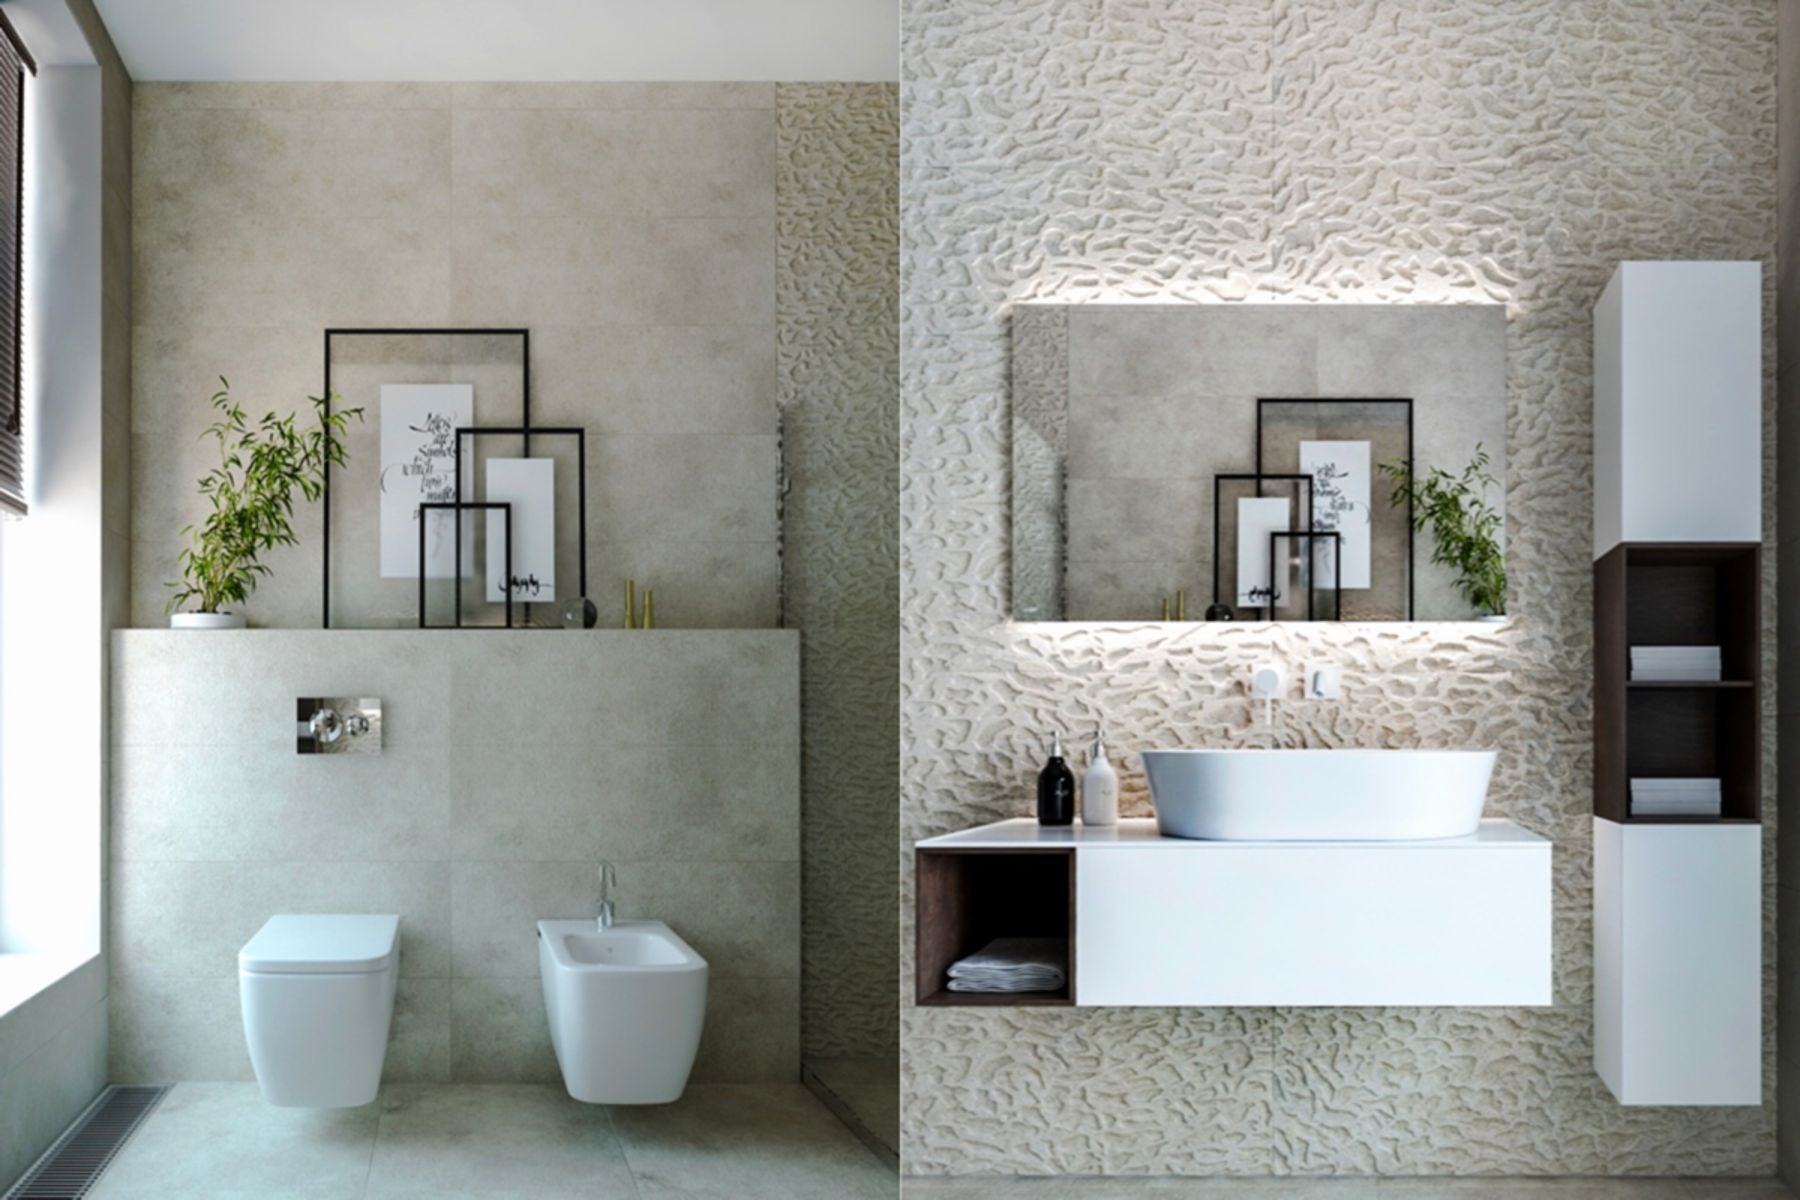 12 Attractive Minimalist Bathroom Design Ideas On A Budget ...